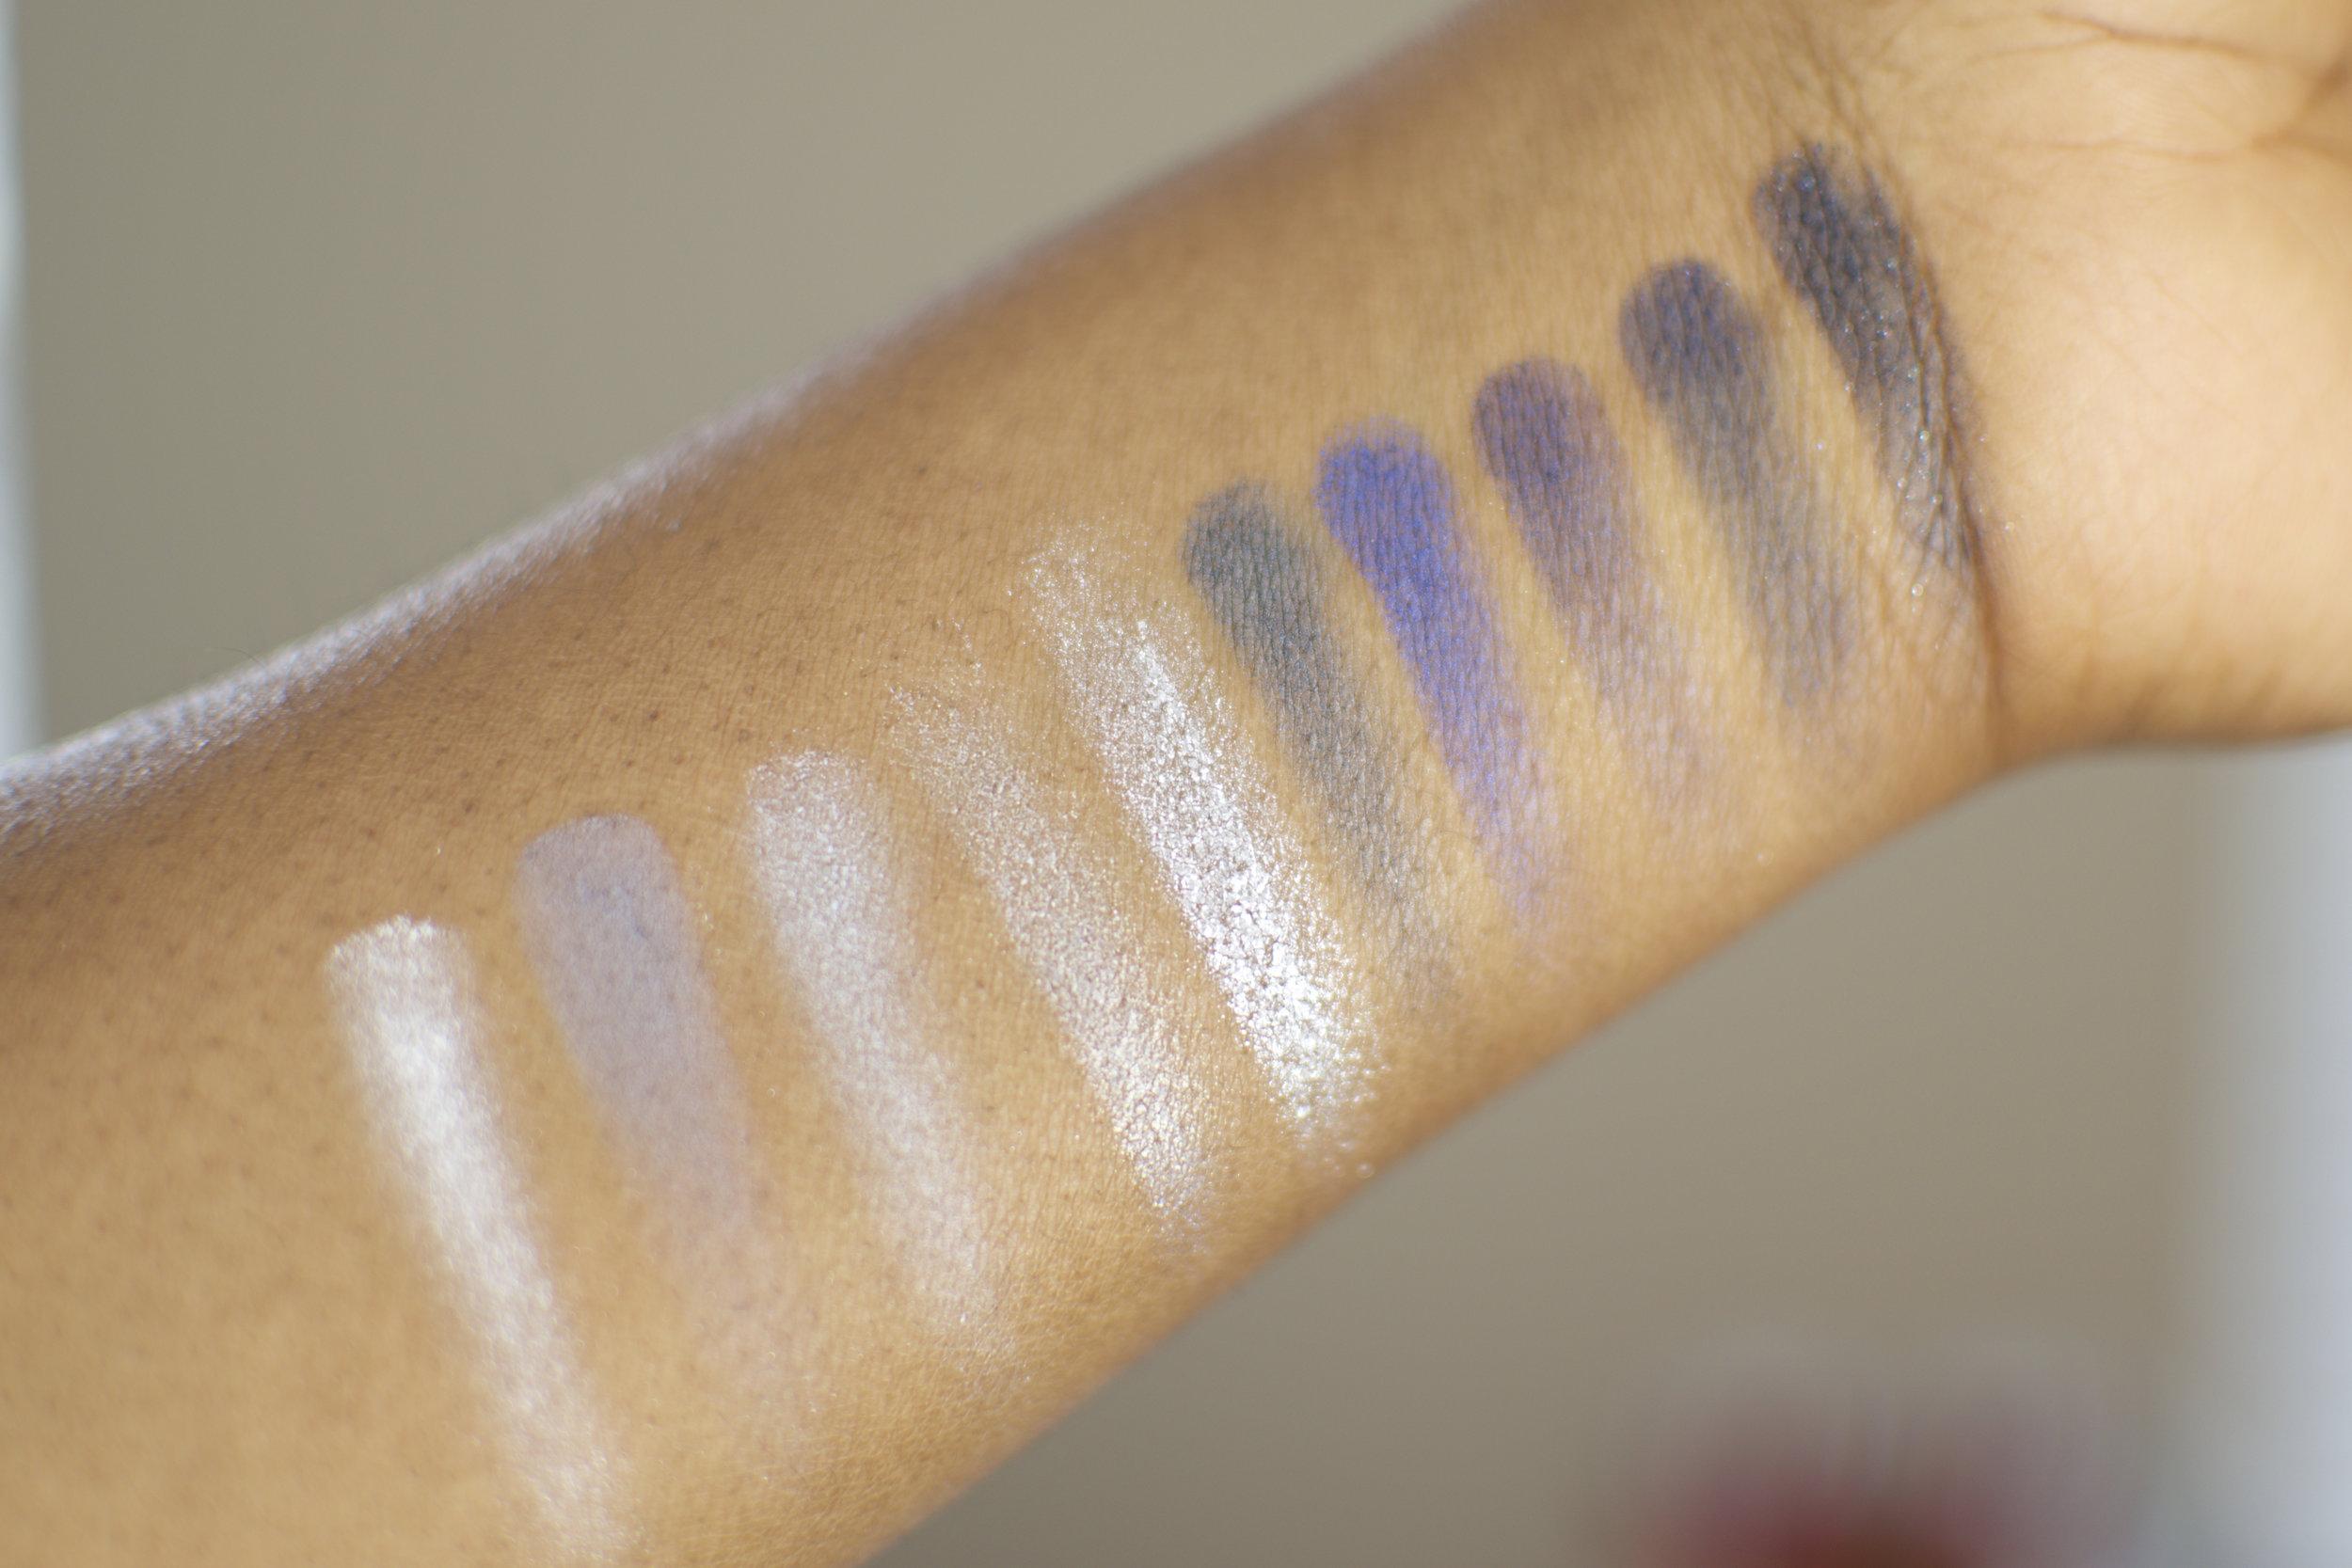 Clarins Palette Makeup Blue Shimmer Glitter Diamond Blue Swatch.jpg